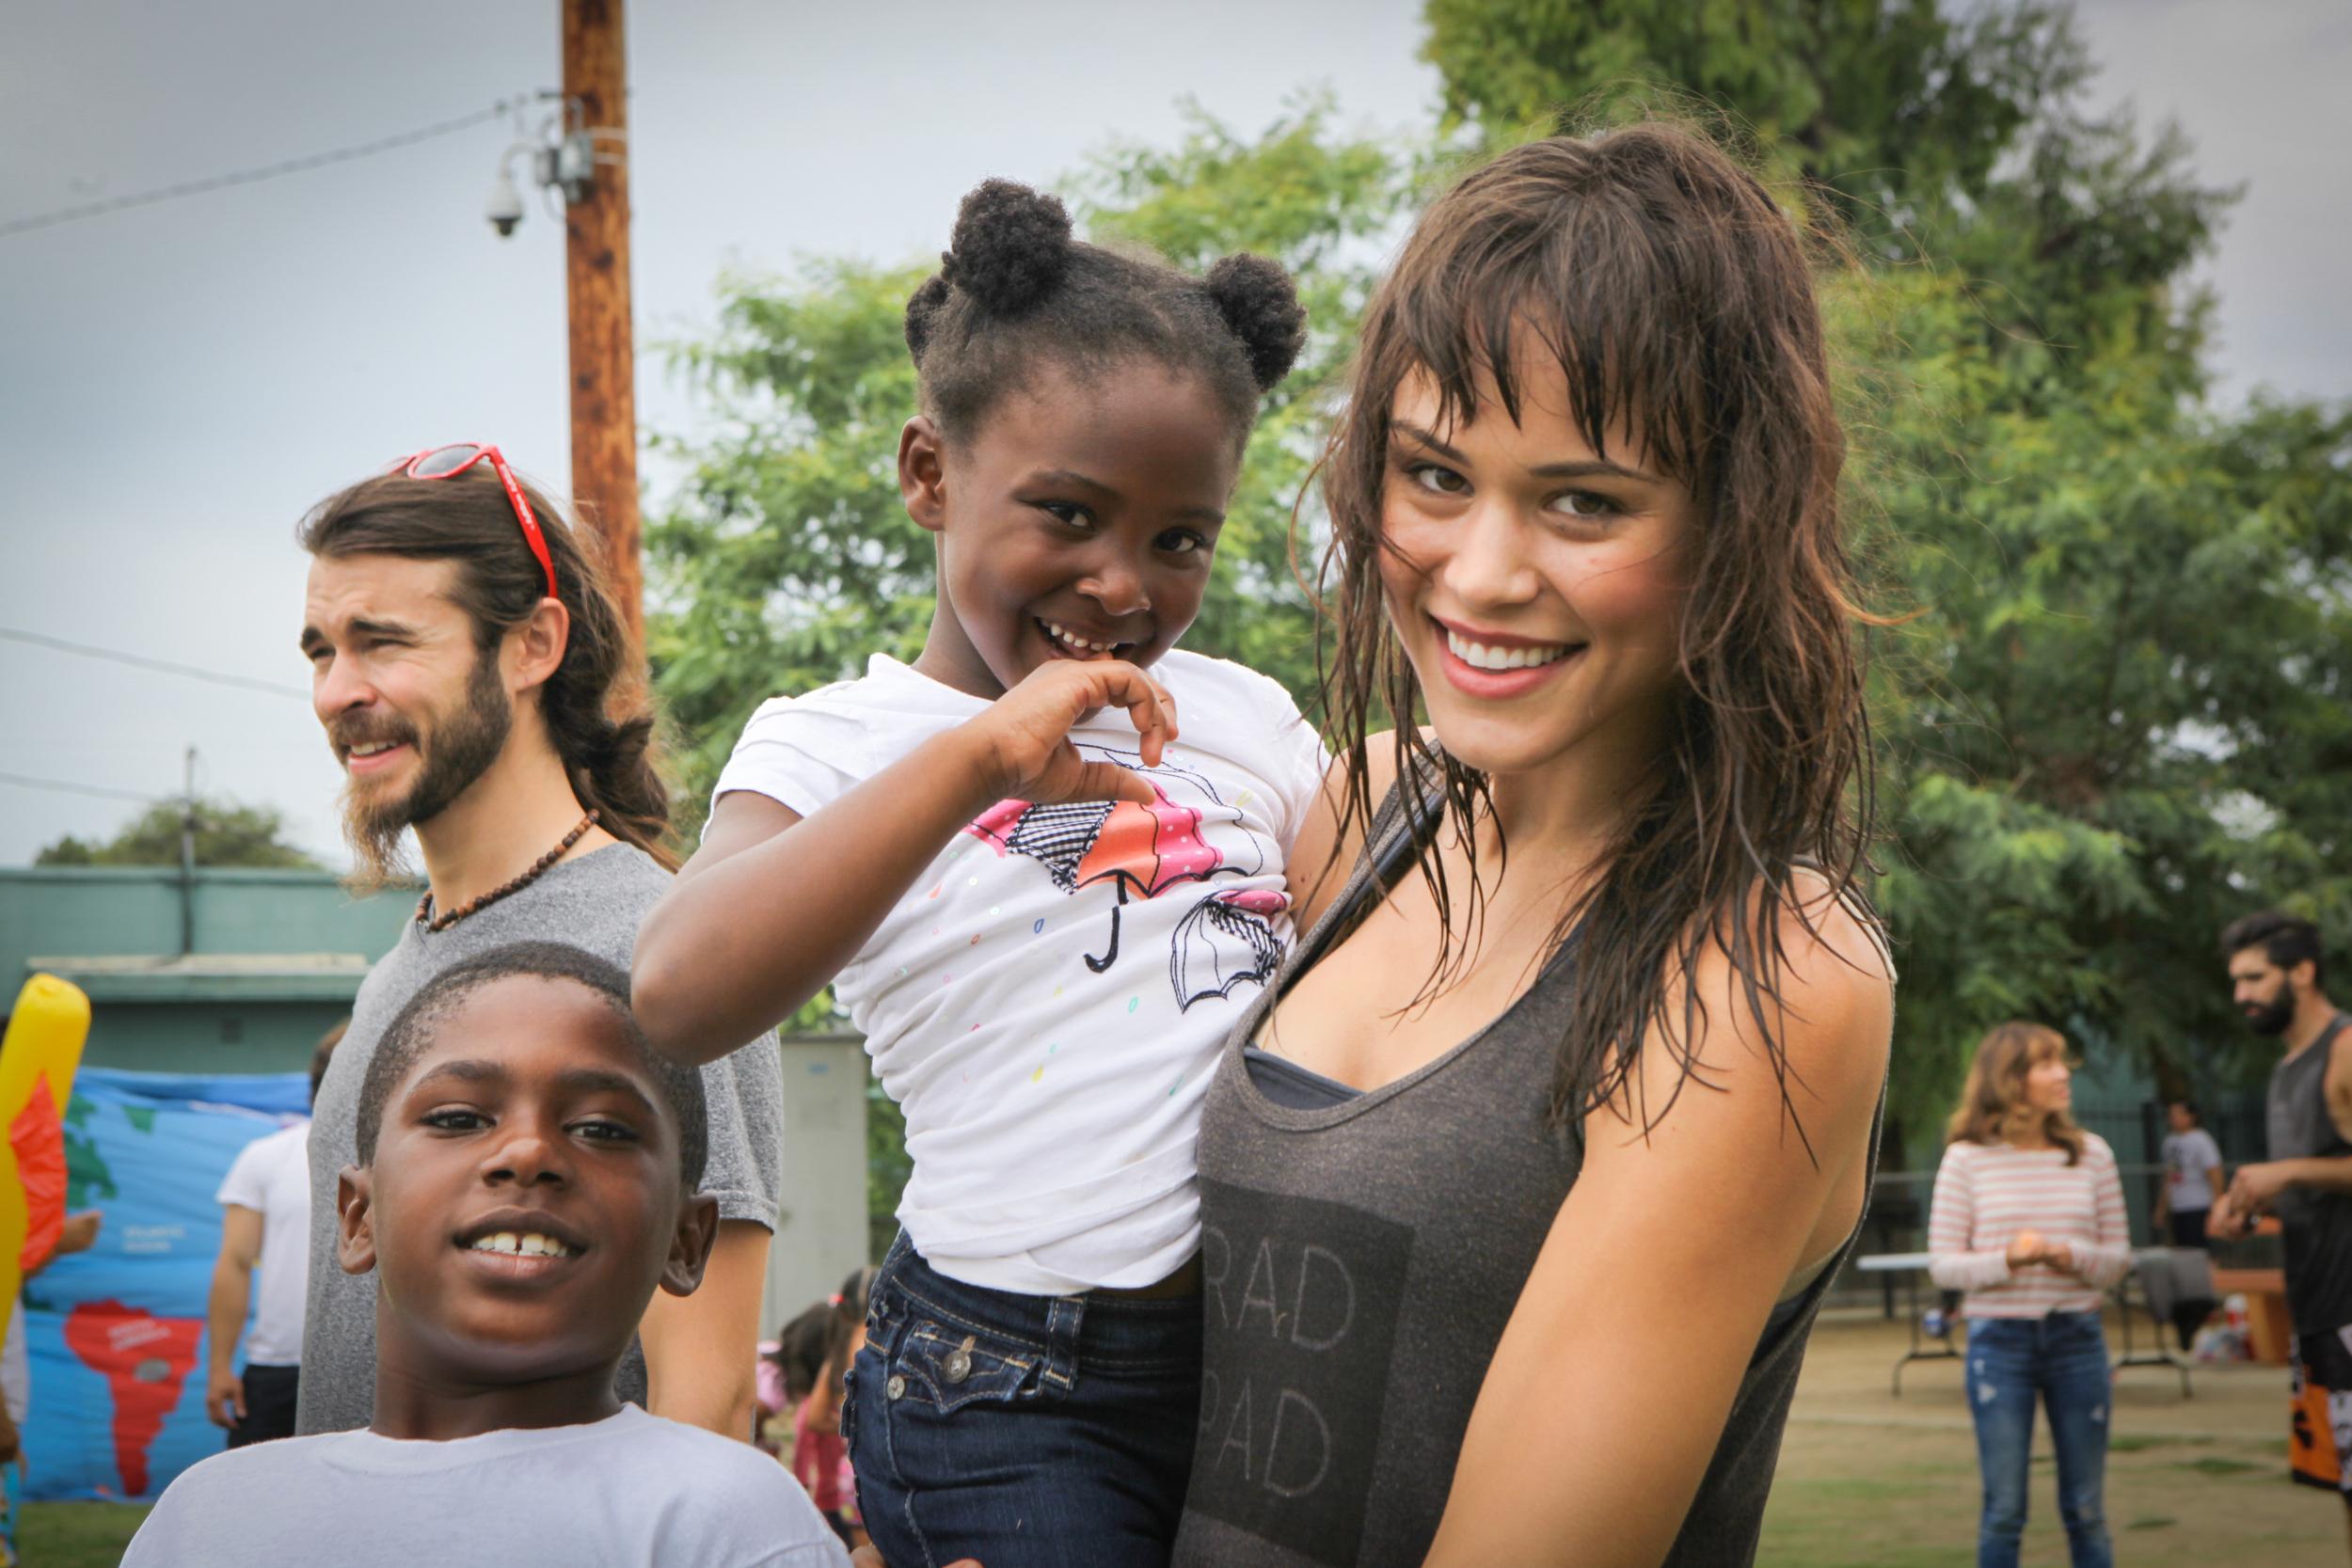 Justin Mayo UNICEF UN:: Charity Youth Mentoring :: Humanitarian Relief :: Fun Fashion Music Healthy :: Hope Help :: Water Kids Children Teens College Intern :: Passion Creativity Community Humanity WSB -31.jpg